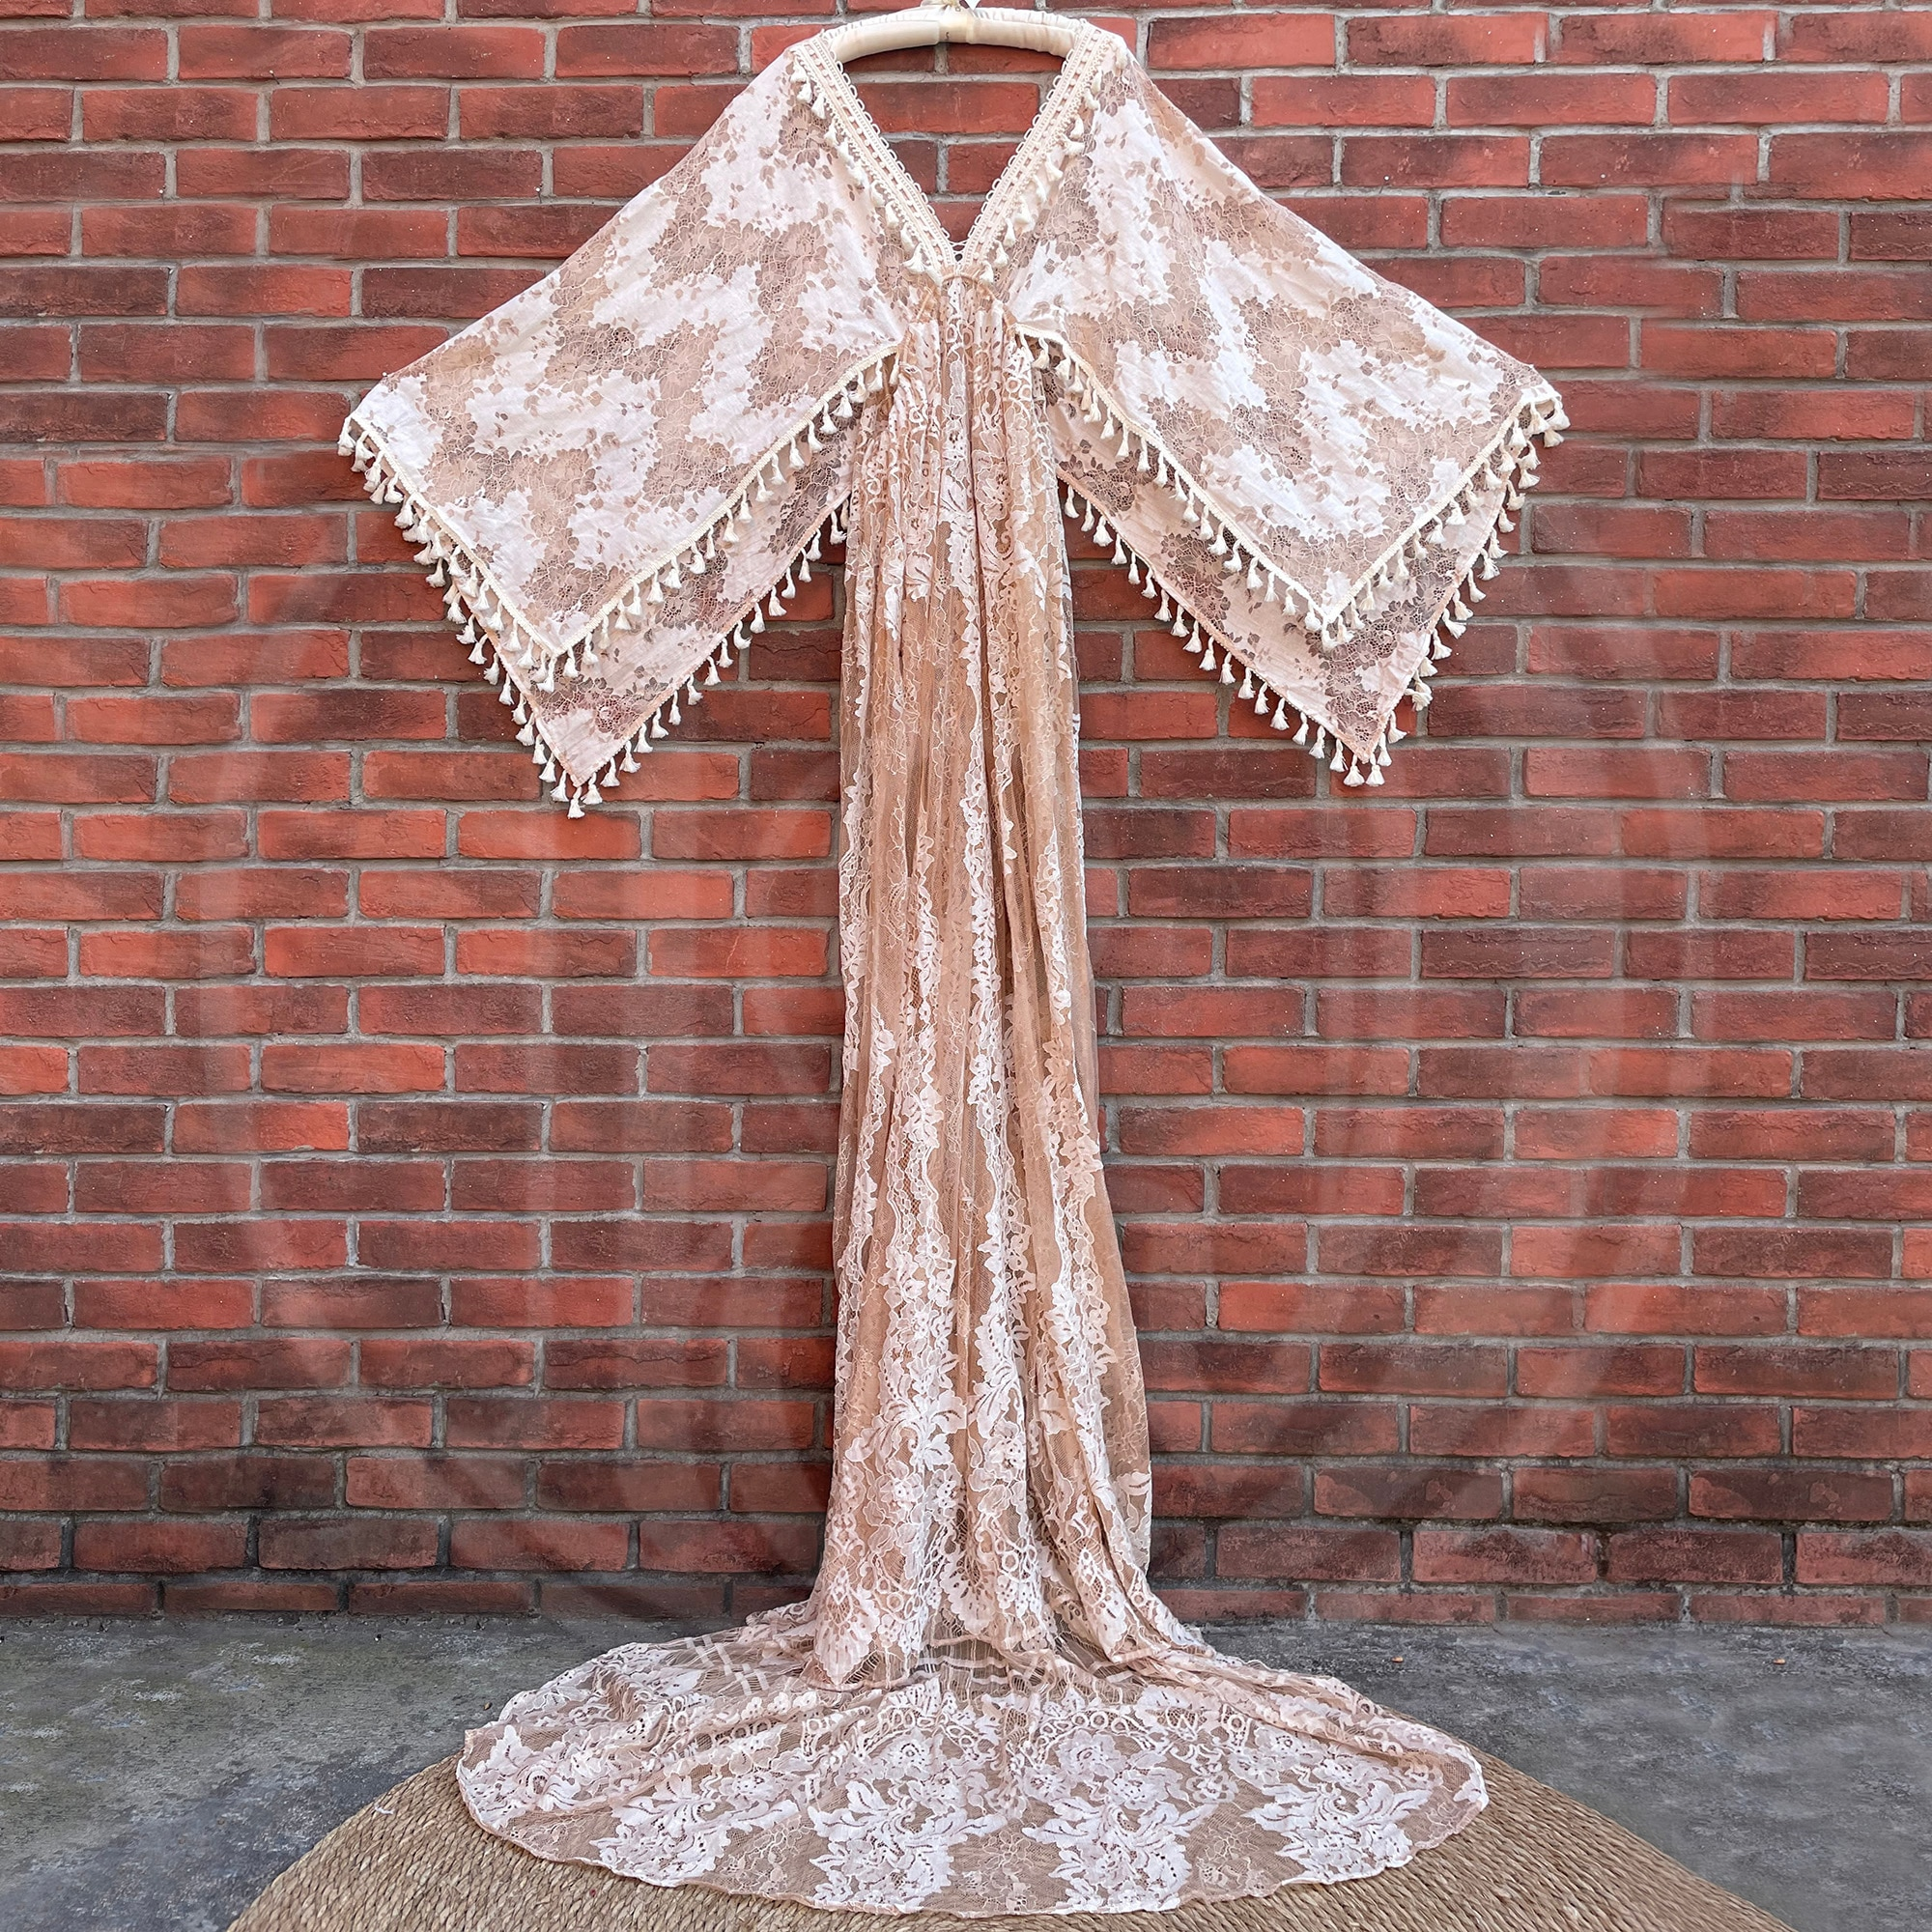 Don&Judy Baby Shower Maternity Photography Props Boho Lace Maxi Dress Elegant Pregnancy Photo Shoot Women Maternity Party 2021 enlarge